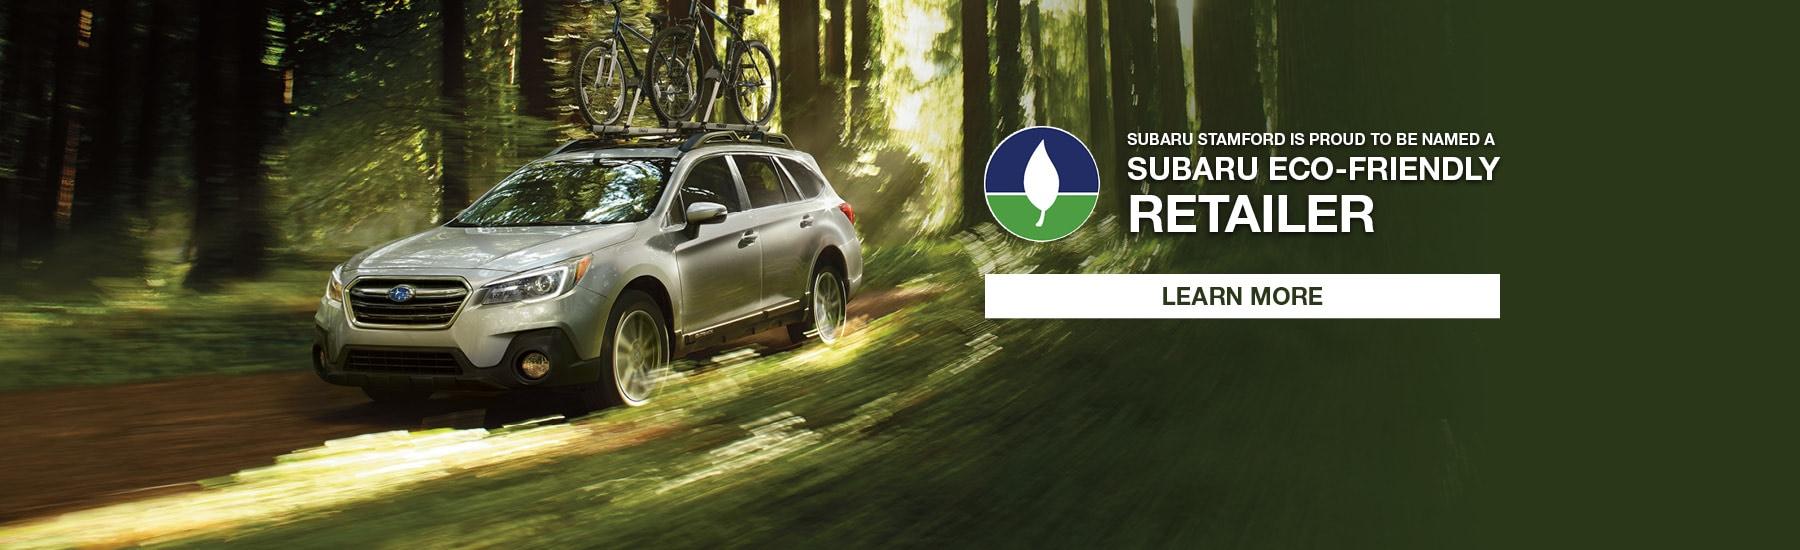 Subaru Dealers In Ct >> New Subaru Used Car Dealer Stamford Ct Serving White Plains